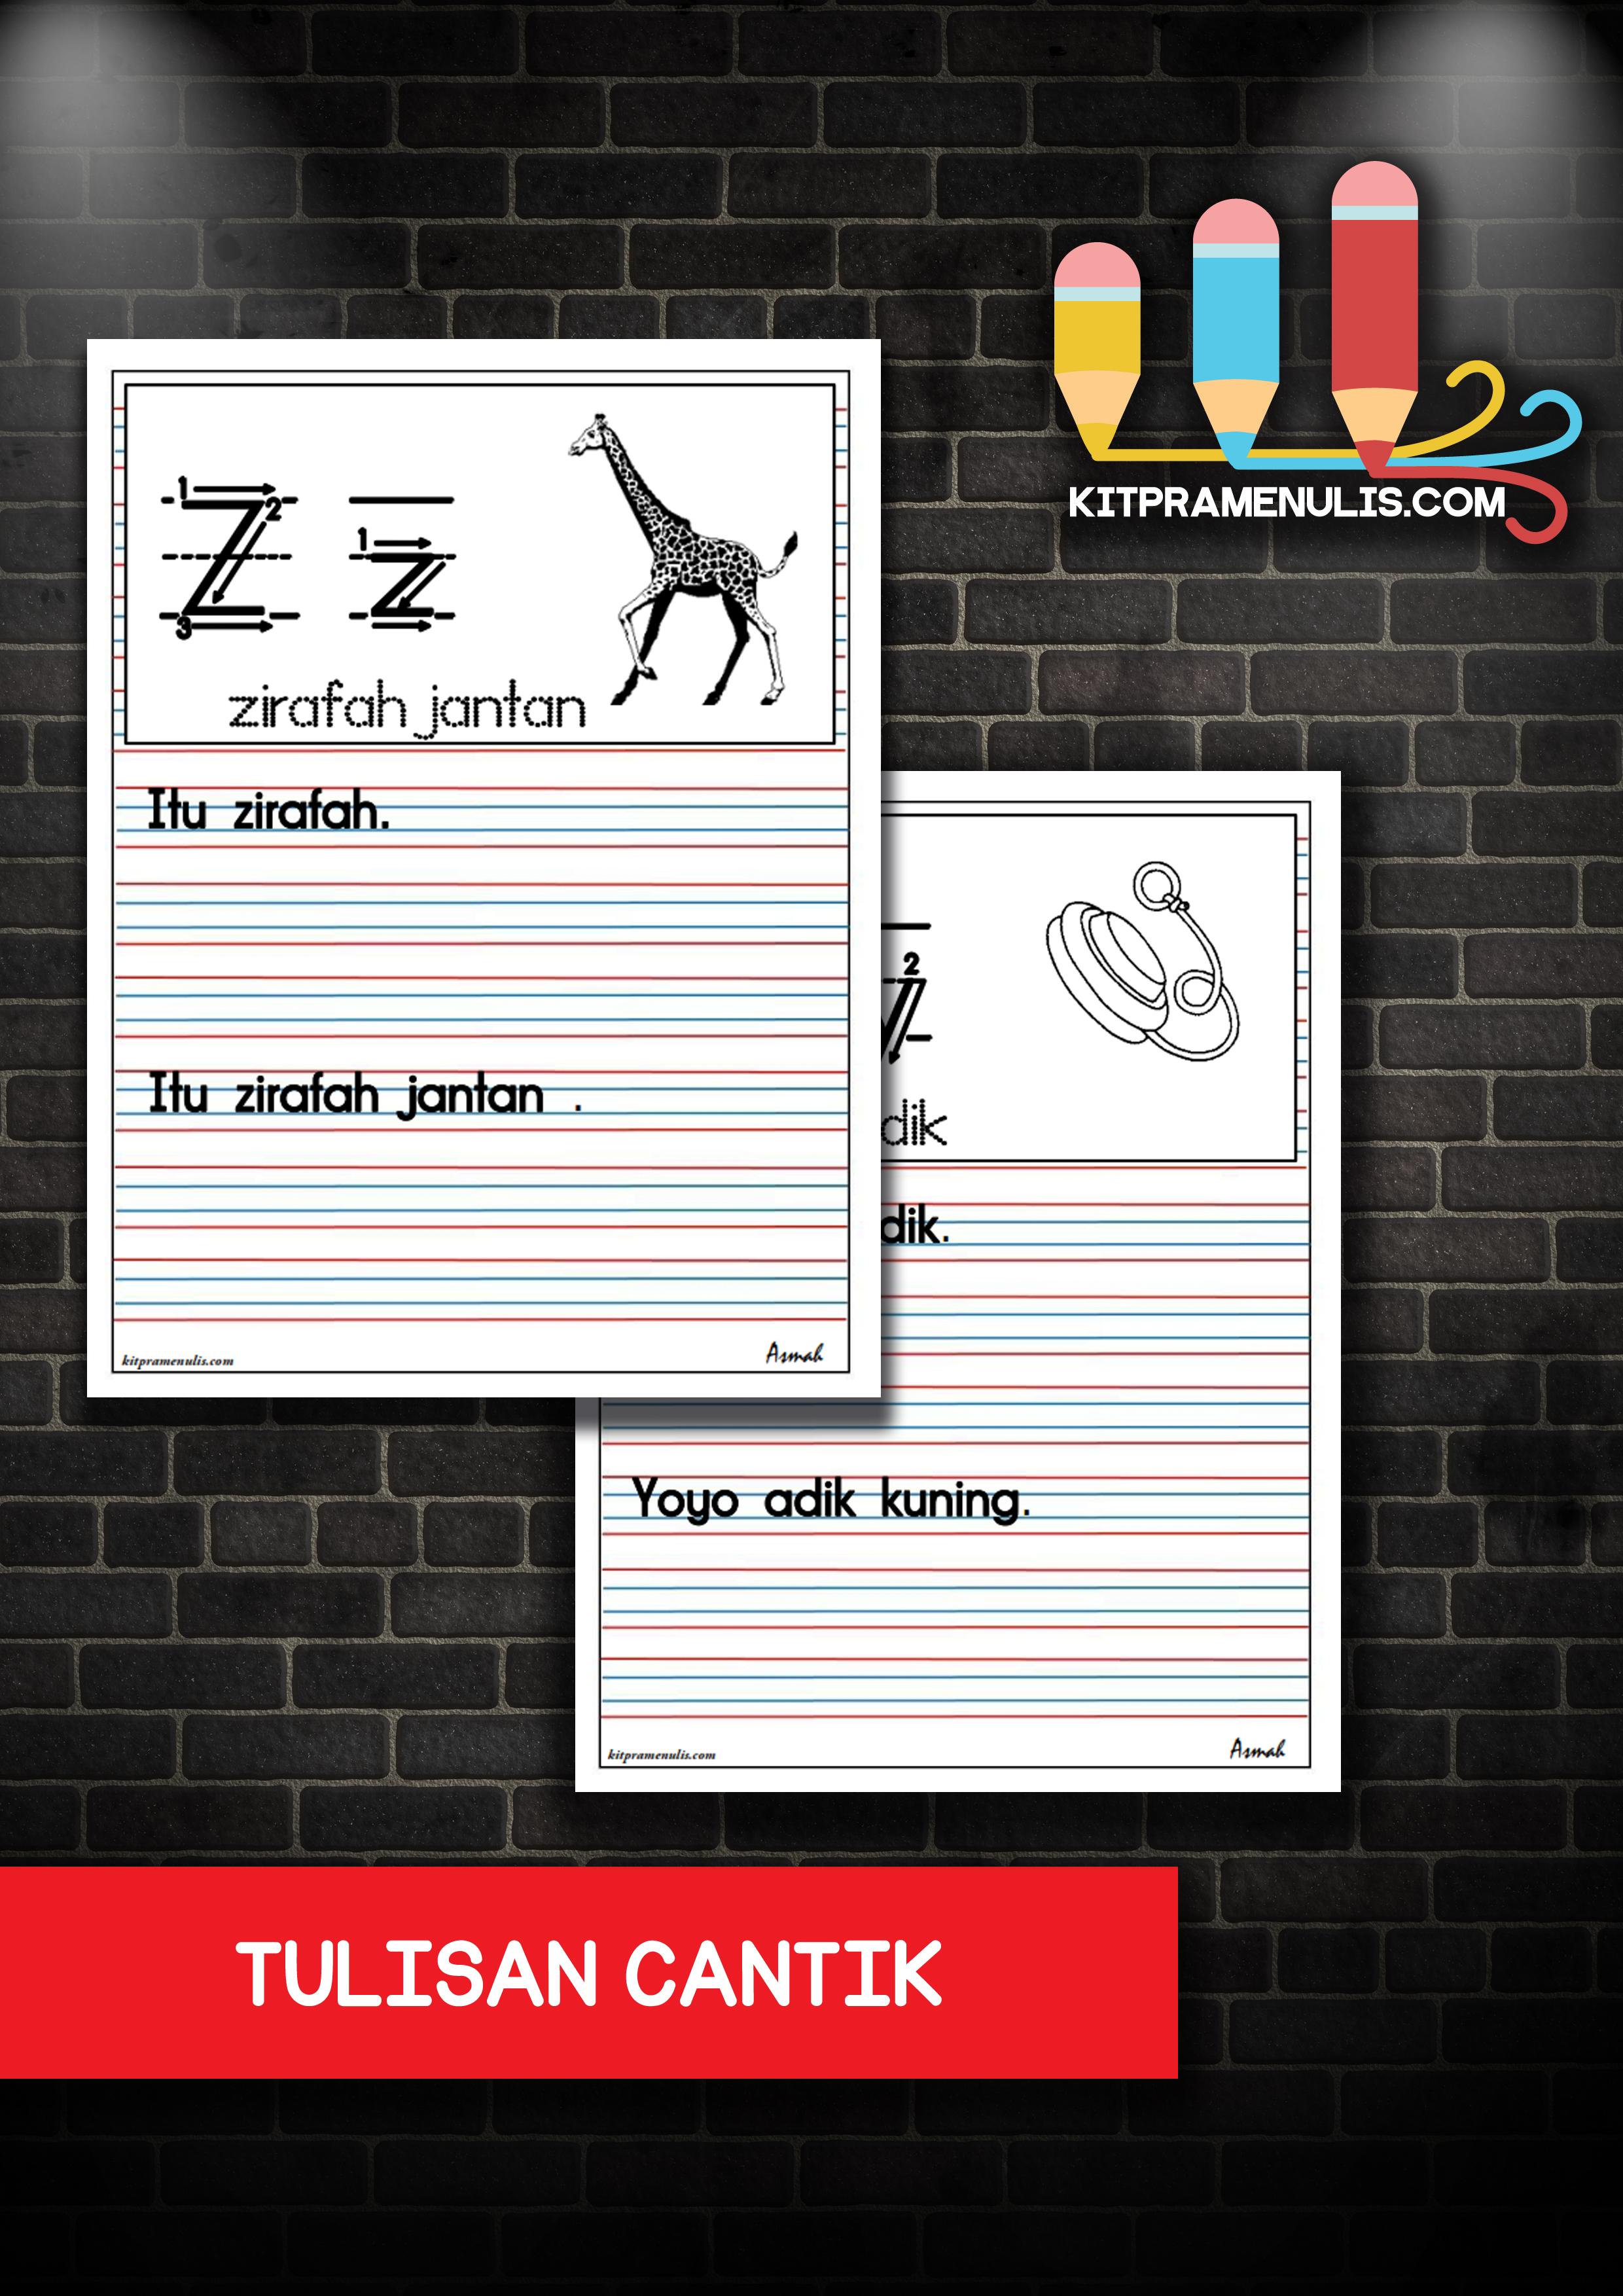 tulisan-cantik Tulisan Cantik | MENULIS DENGAN MENGGUNAKAN GARIS 3